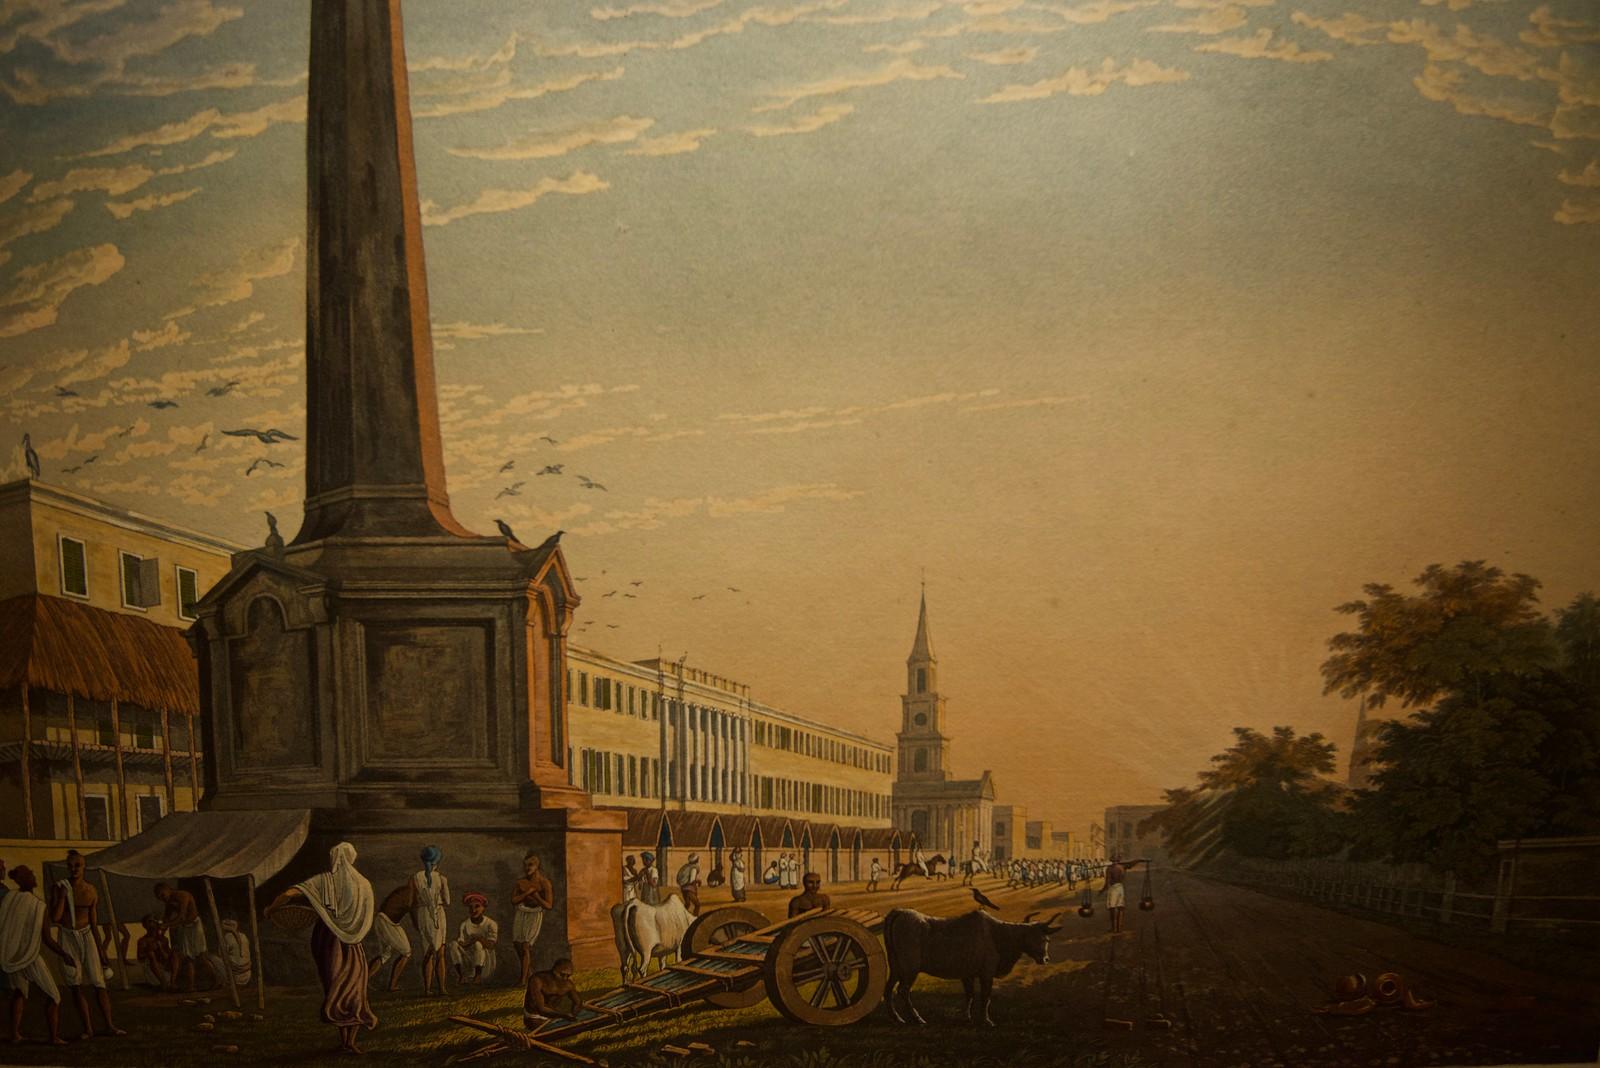 孟買歷史文物博物館 第四章 (CHHATRAPATI SHIVAJI MAHARAJ VASTU SANGRAHALAYA PART 4) – MESS SKY chaos & creation